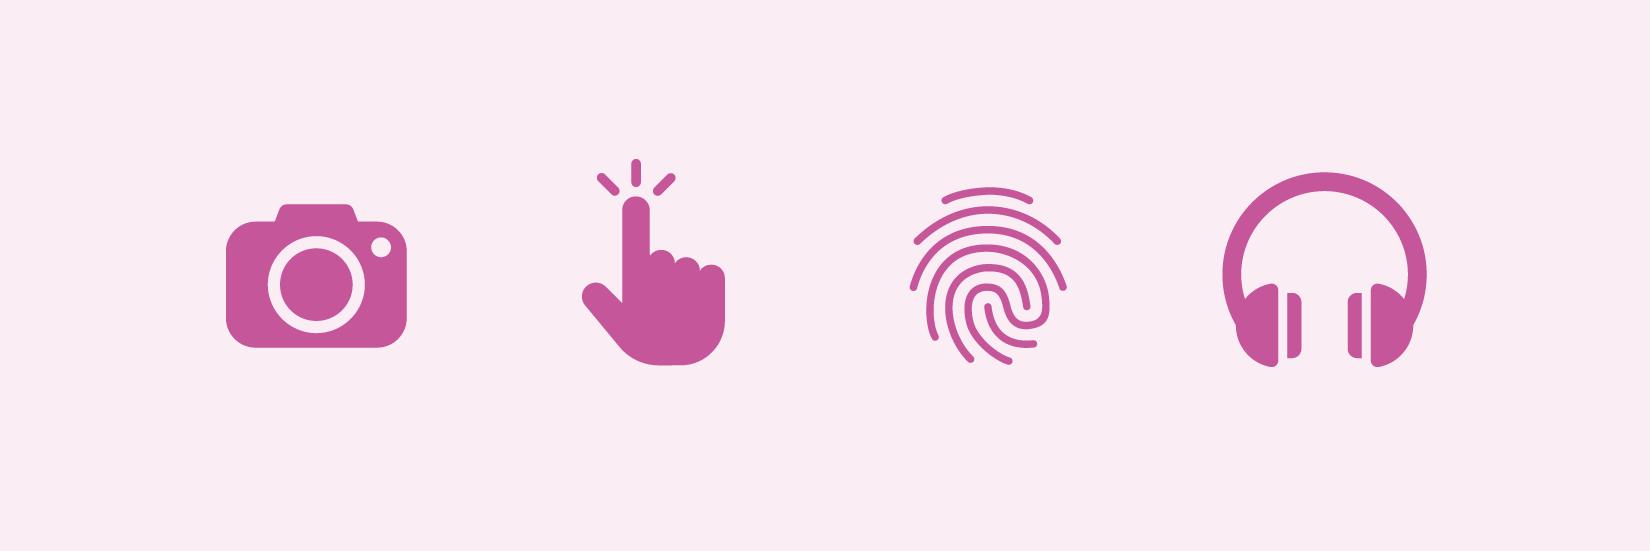 Swedbank symbols